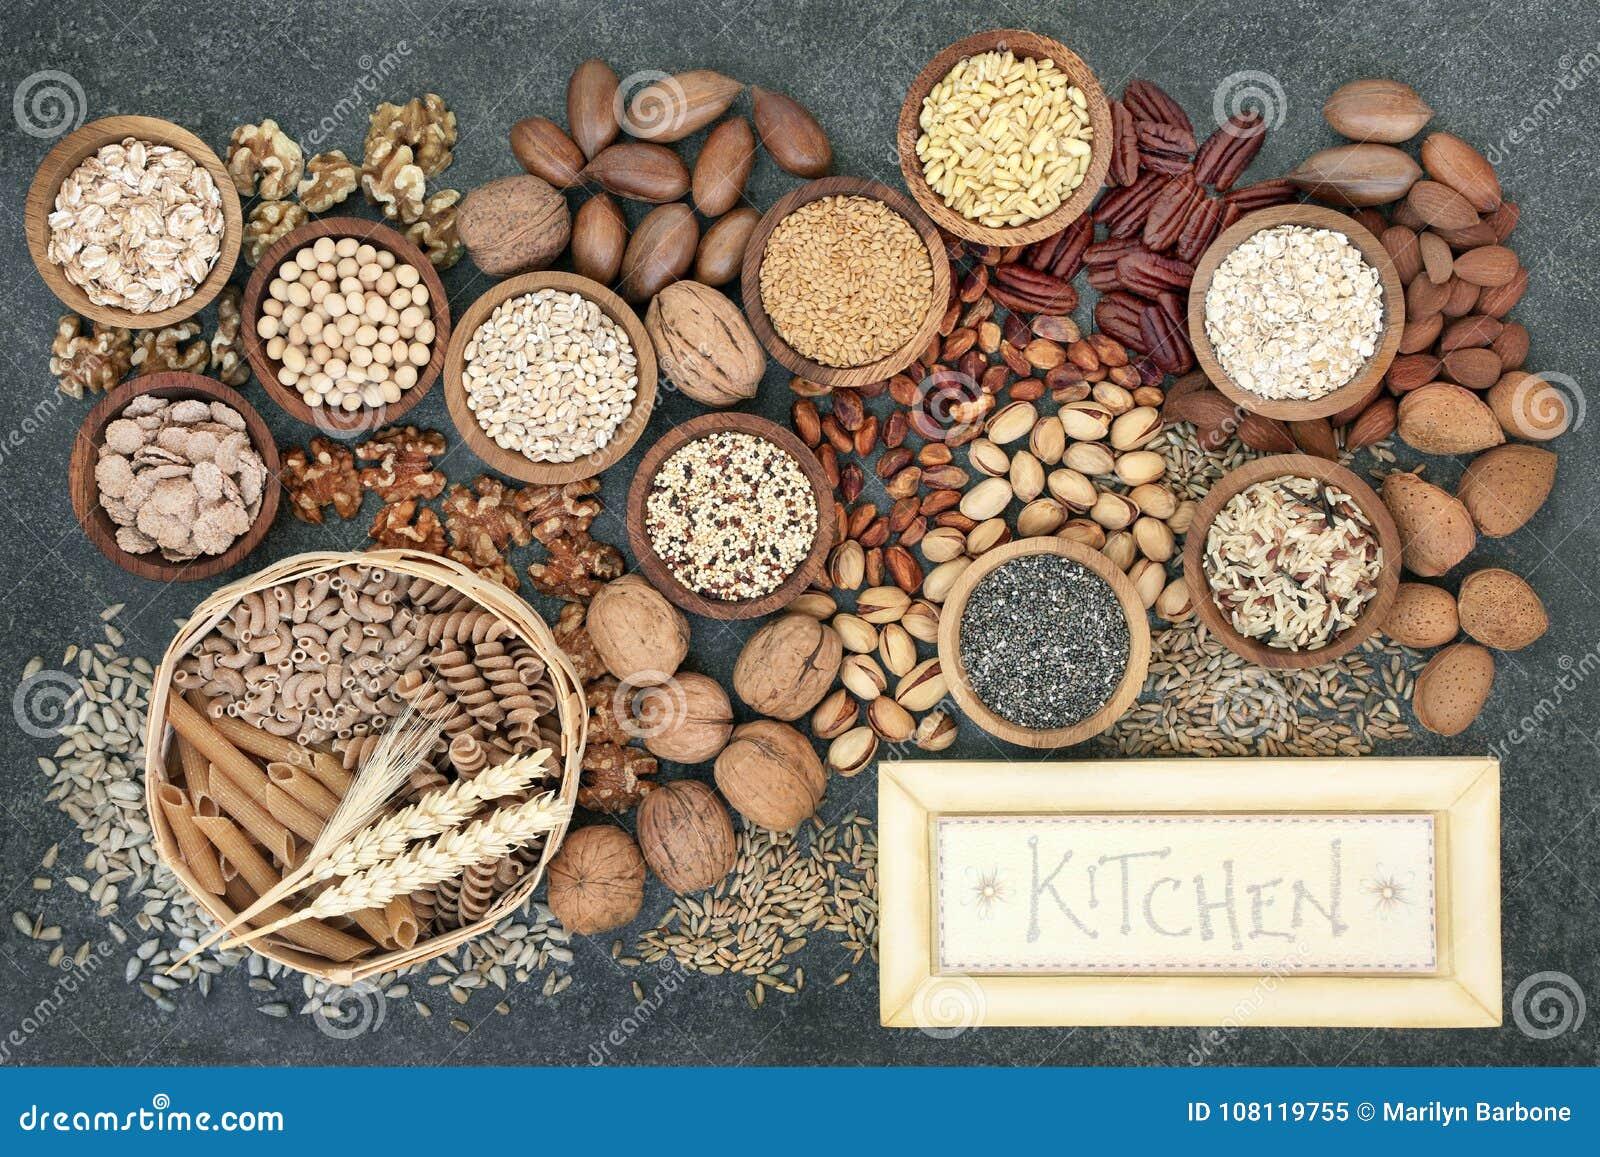 Dried High Fiber Health Food